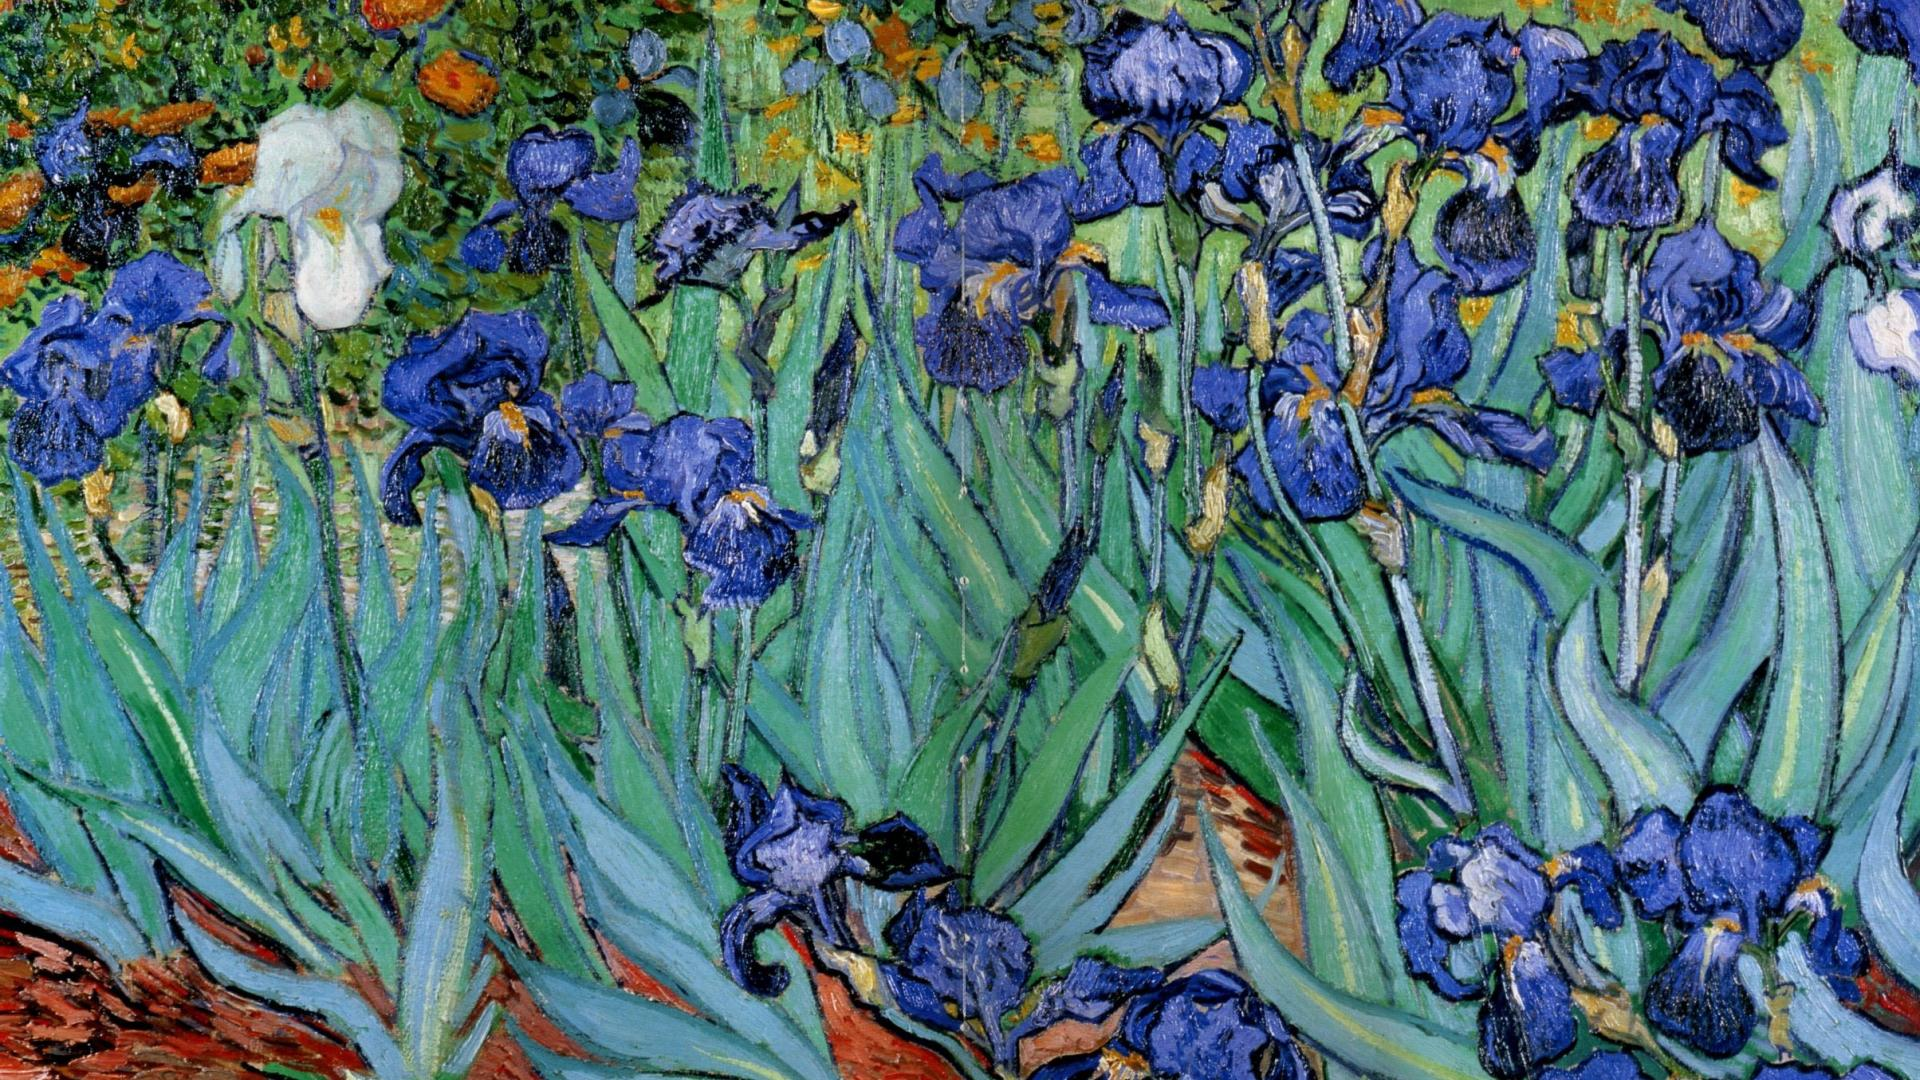 van gogh paintings wallpaper,flower,plant,flowering plant,iris,iris family